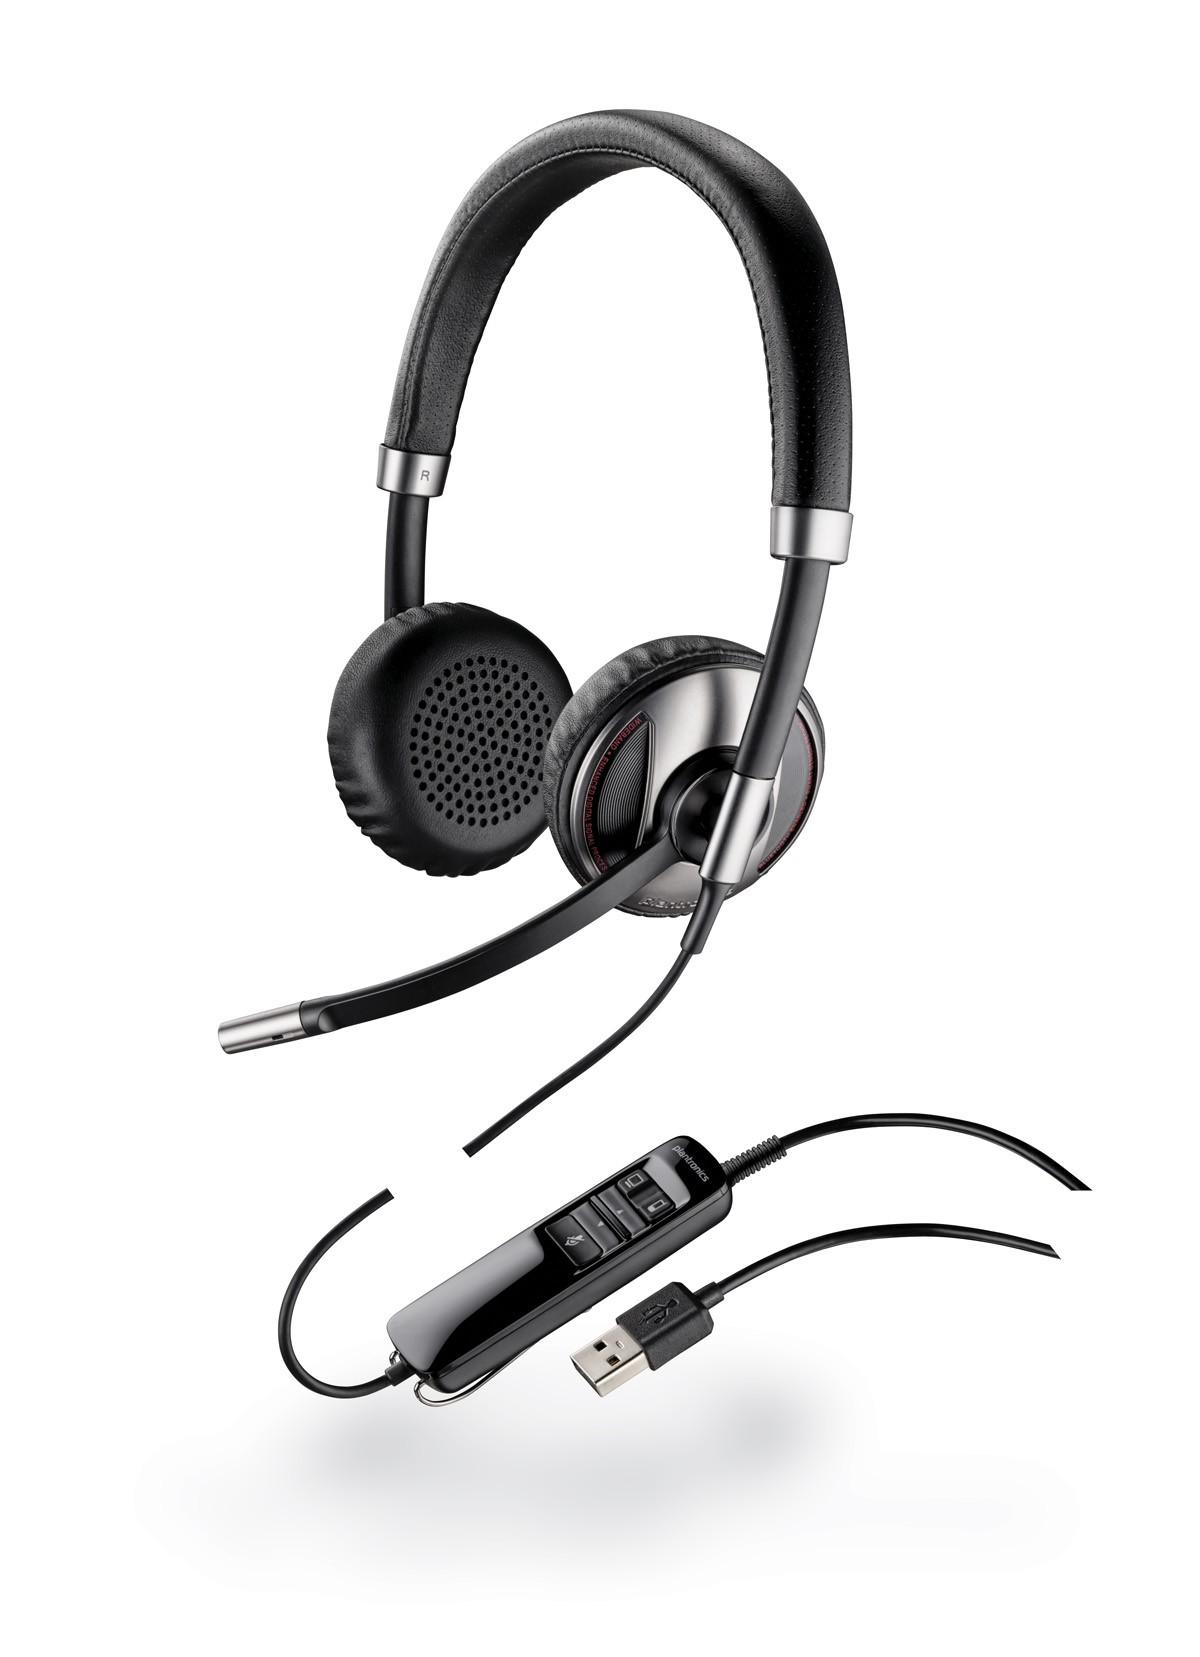 Plantronics Blackwire C720 M Microsoft 87506 11 Headsetlink